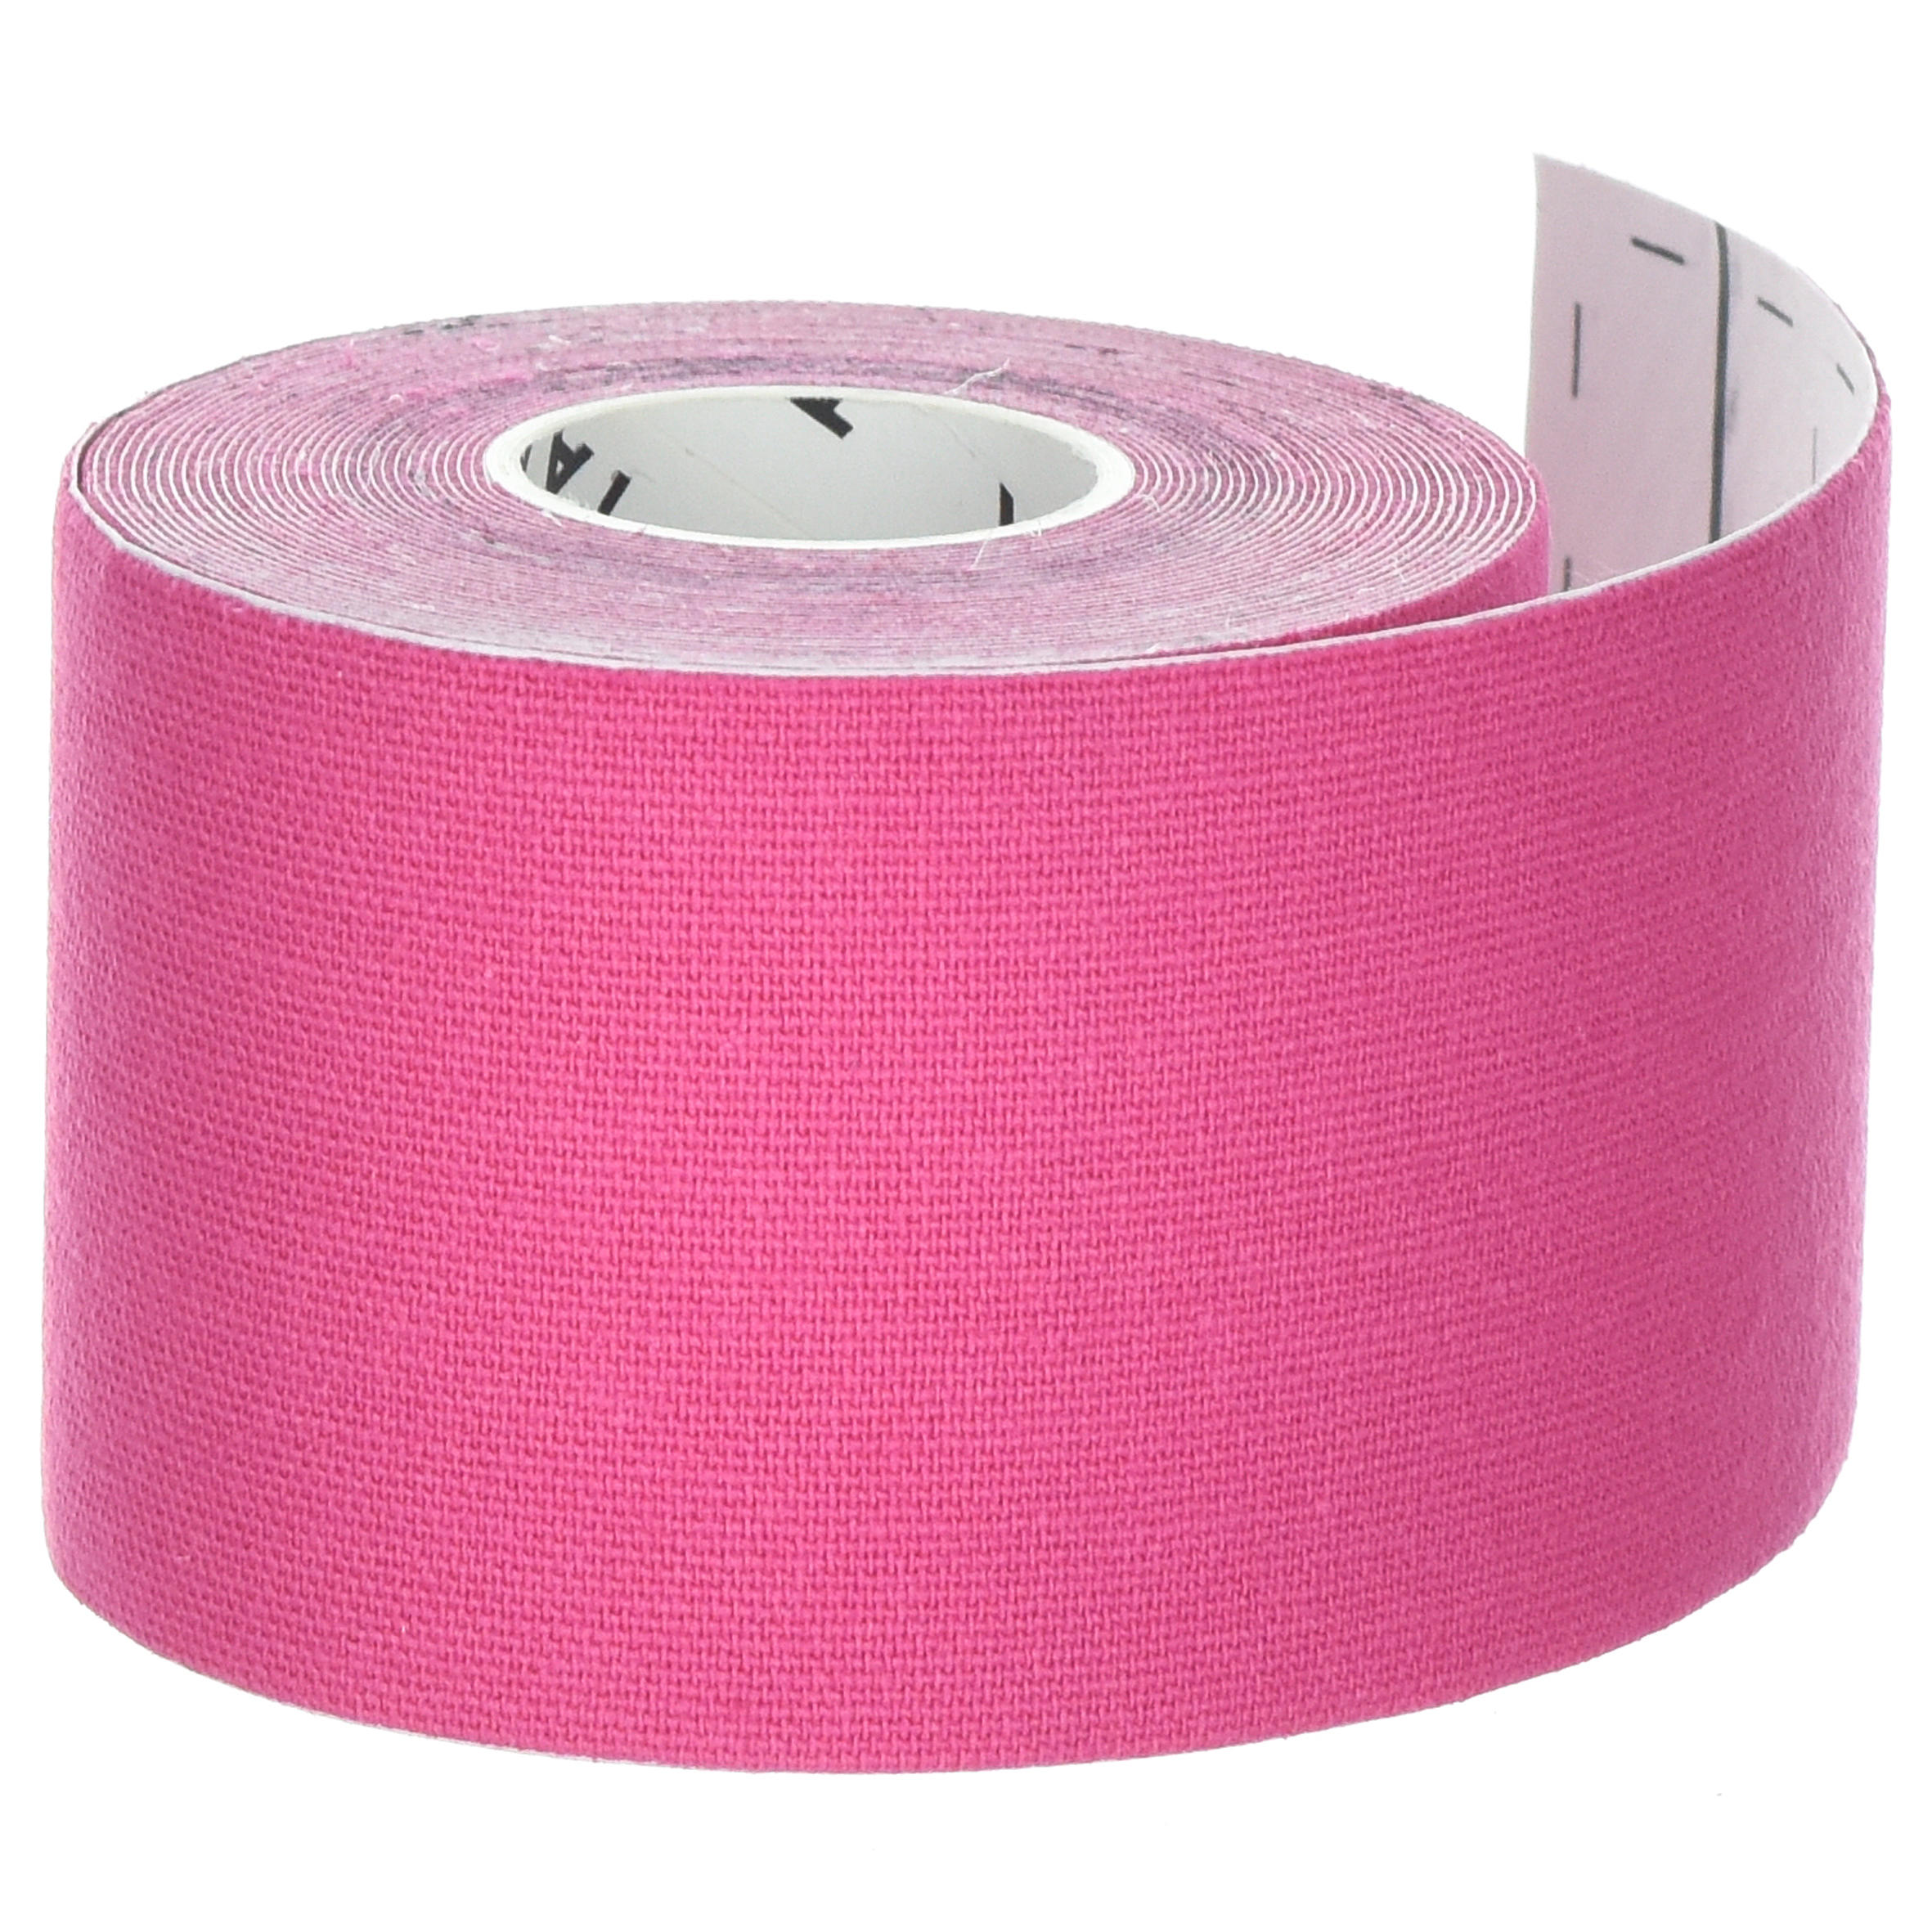 Kinesio Tape 5 cm x 5 m - Pink